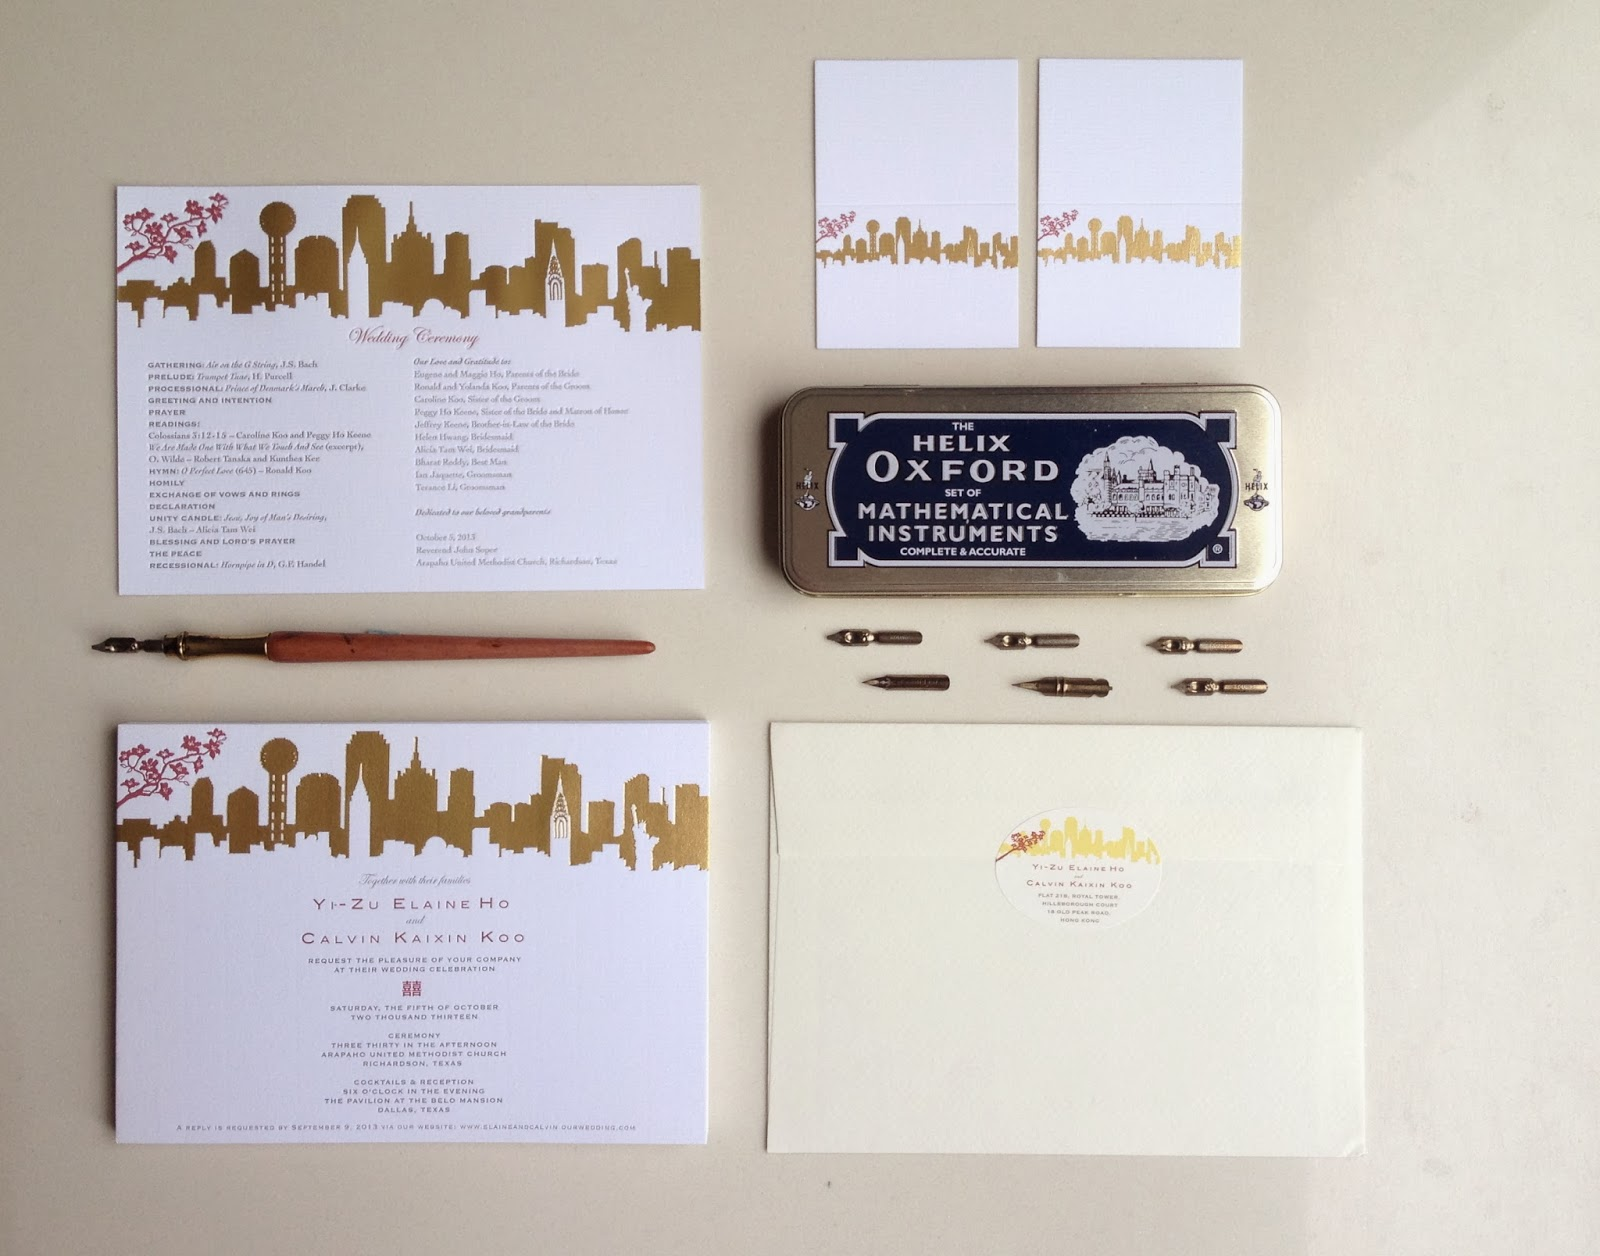 Wedding Invitations Dallas: Kalo Make Art Bespoke Wedding Invitation Designs: December